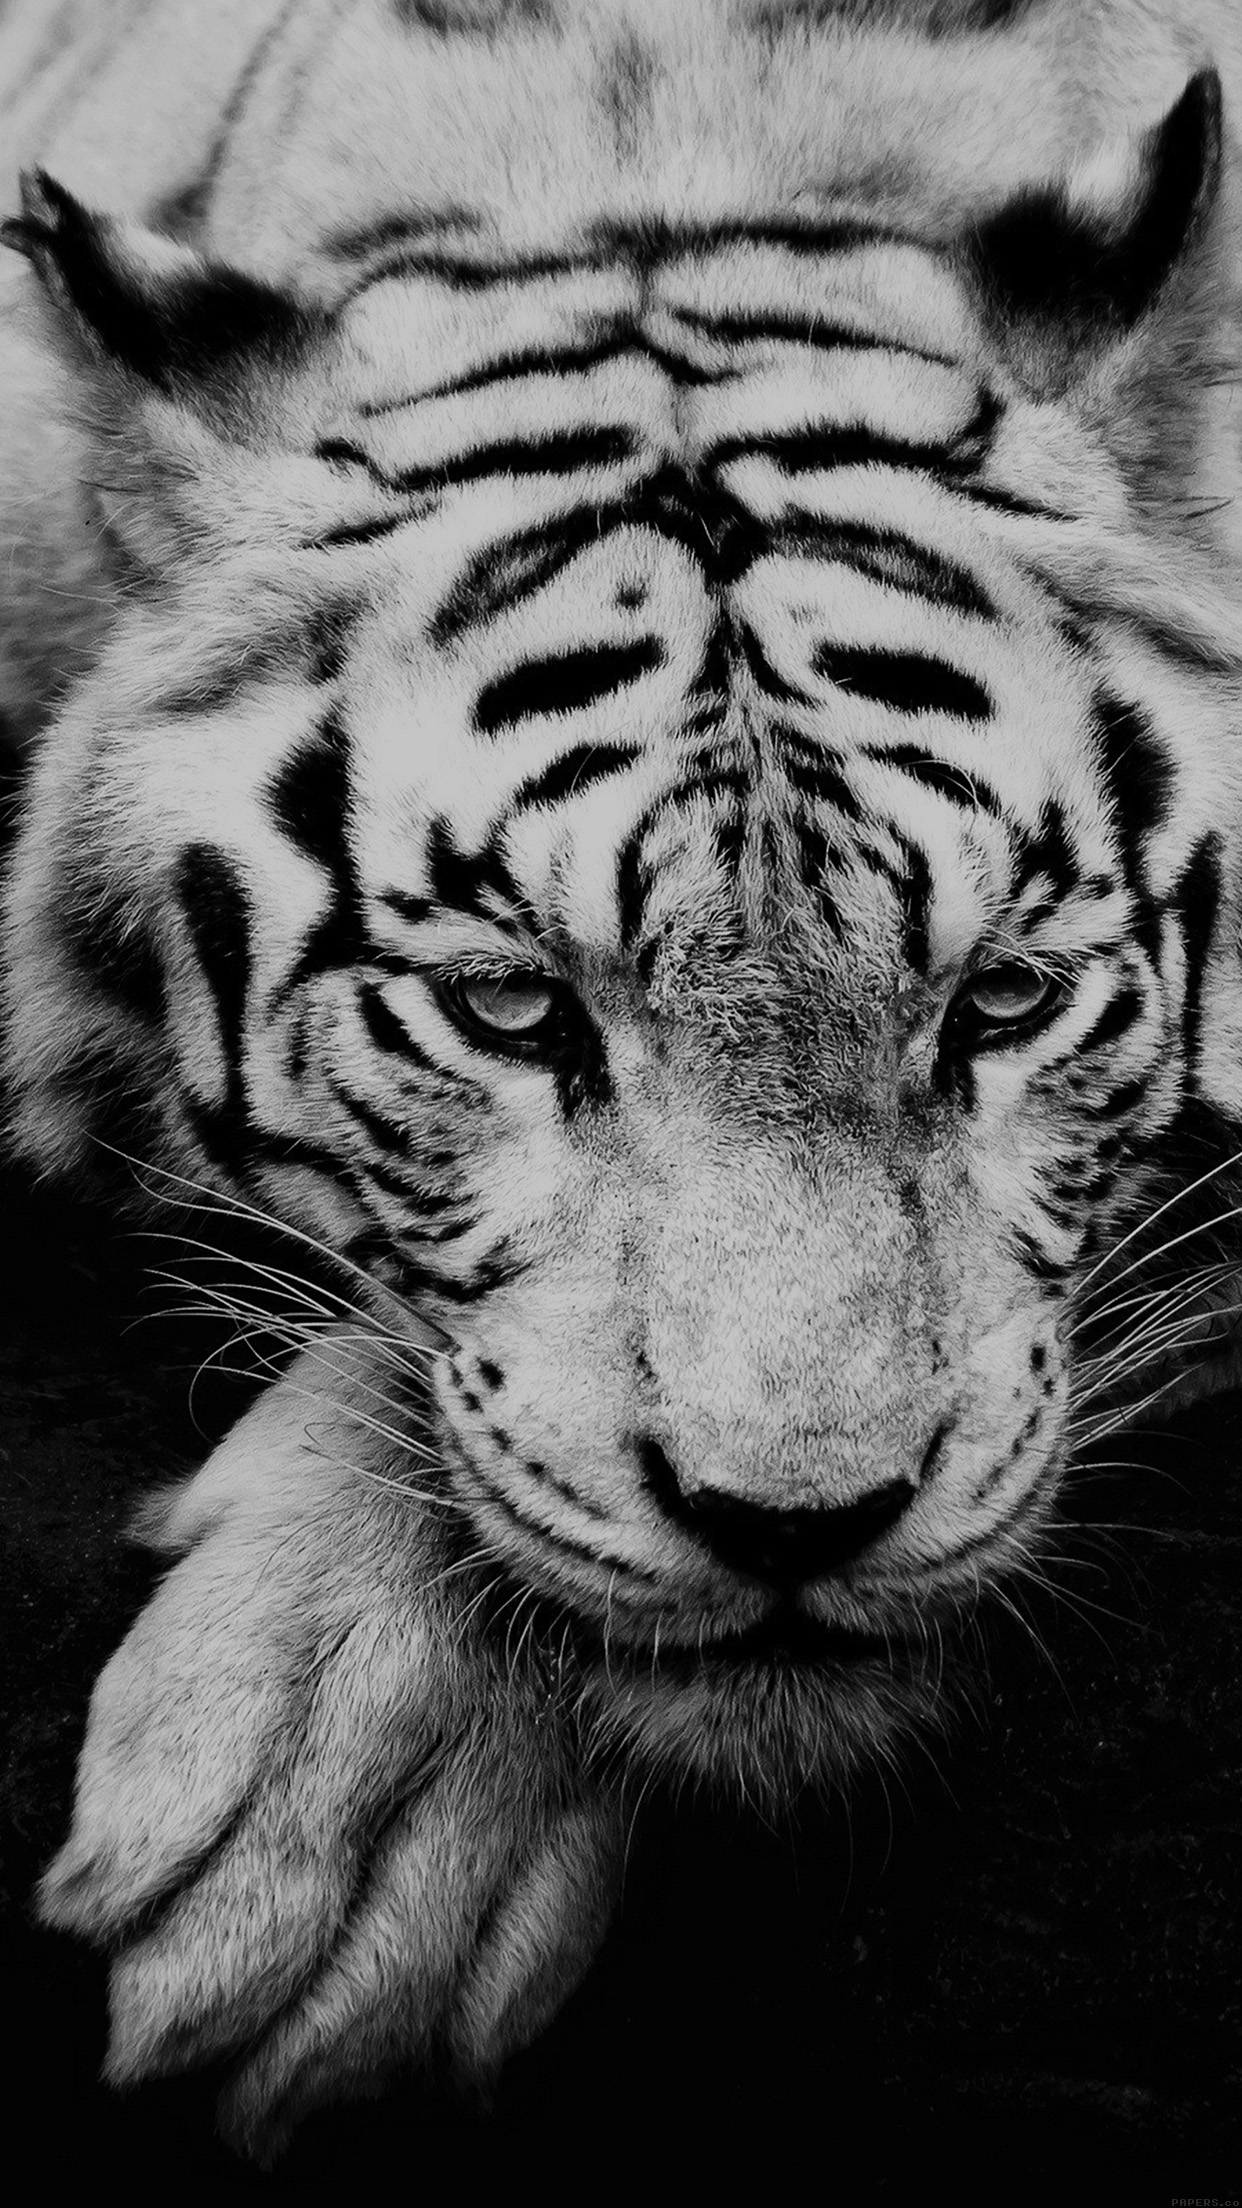 Iphone6papers Ml57 Bw Dark Tiger Animal